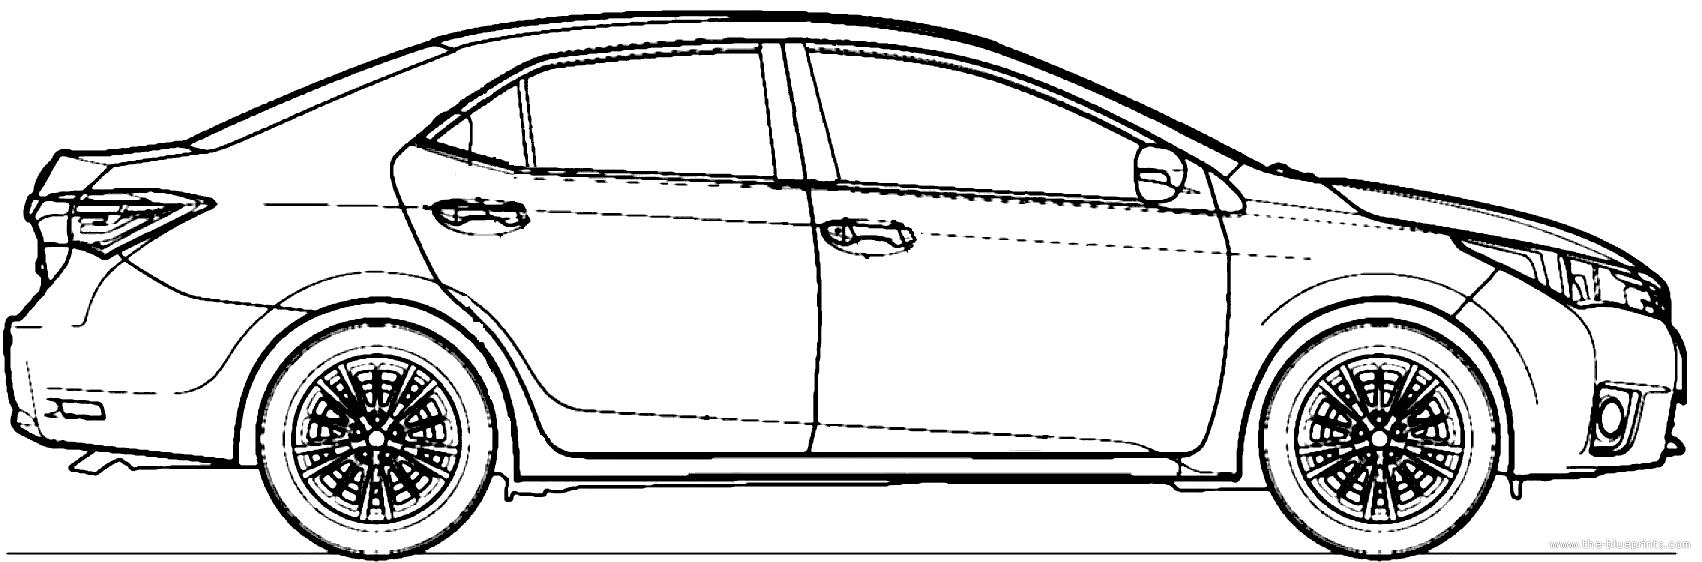 The Blueprints Com Blueprints Gt Cars Gt Toyota Gt Toyota